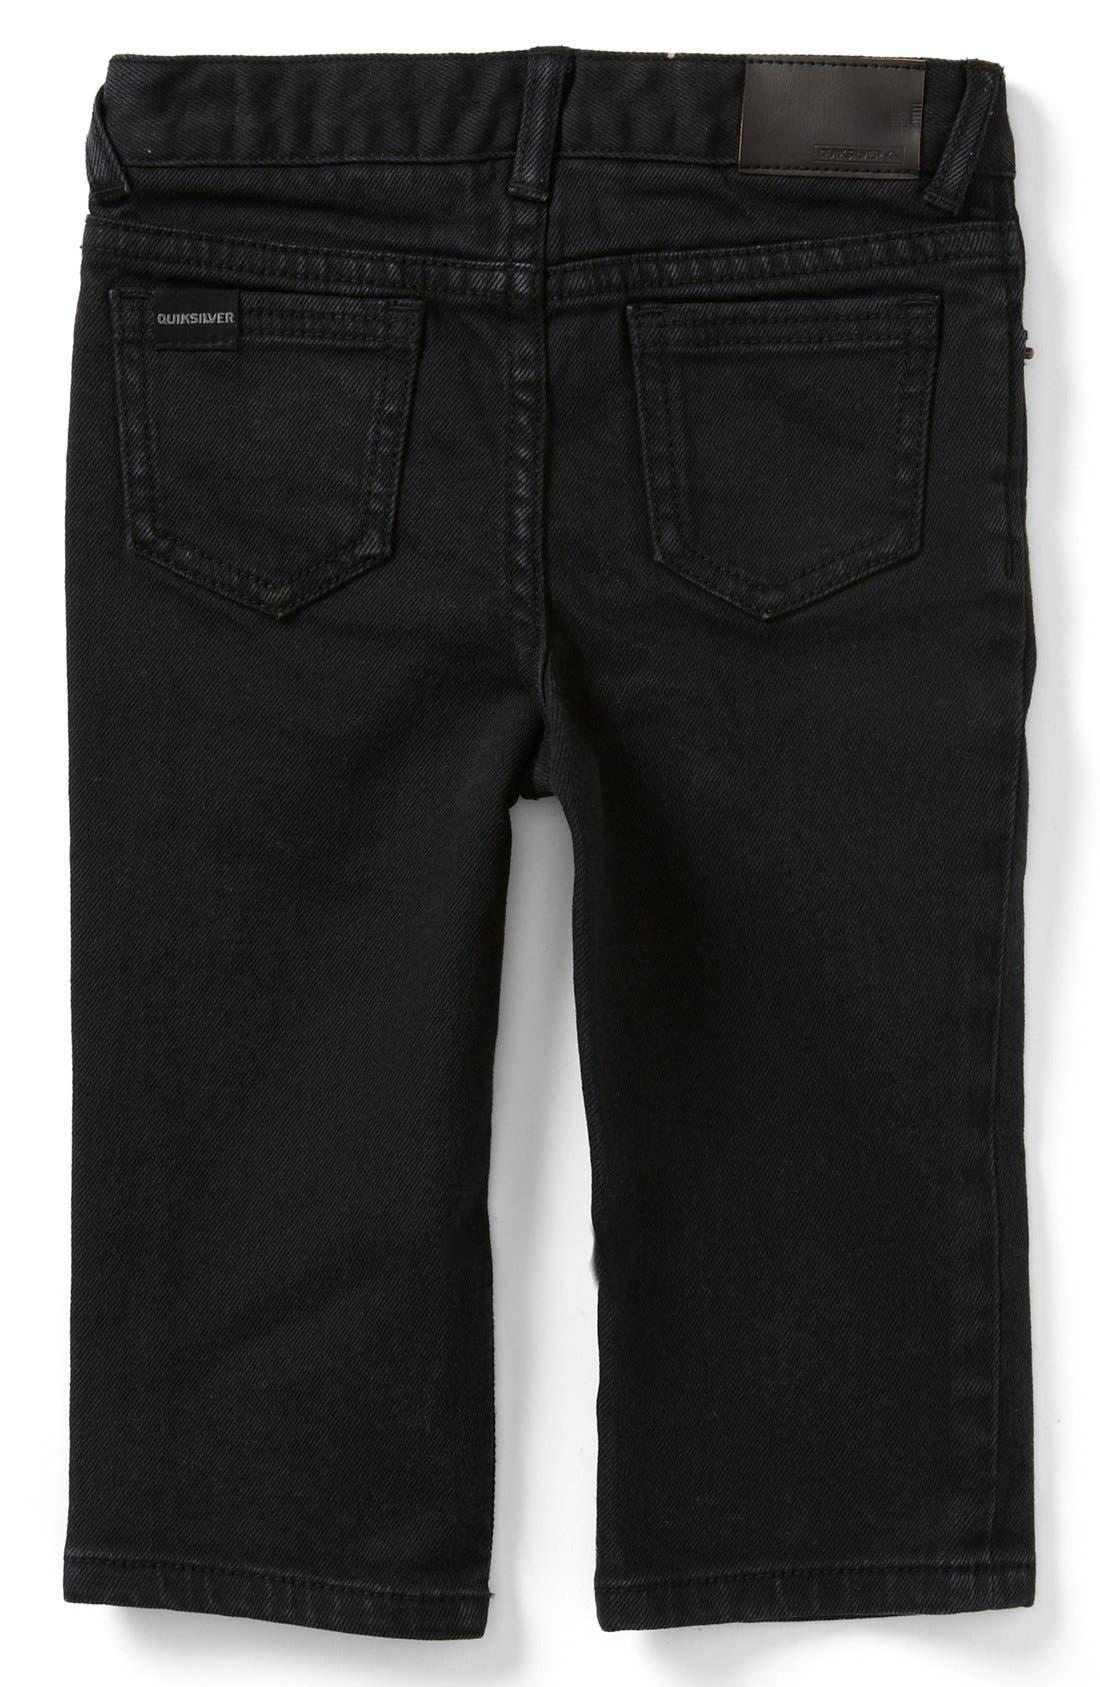 Alternate Image 1 Selected - Quiksilver 'Distortion' Slim Straight Leg Jeans (Baby Boys)